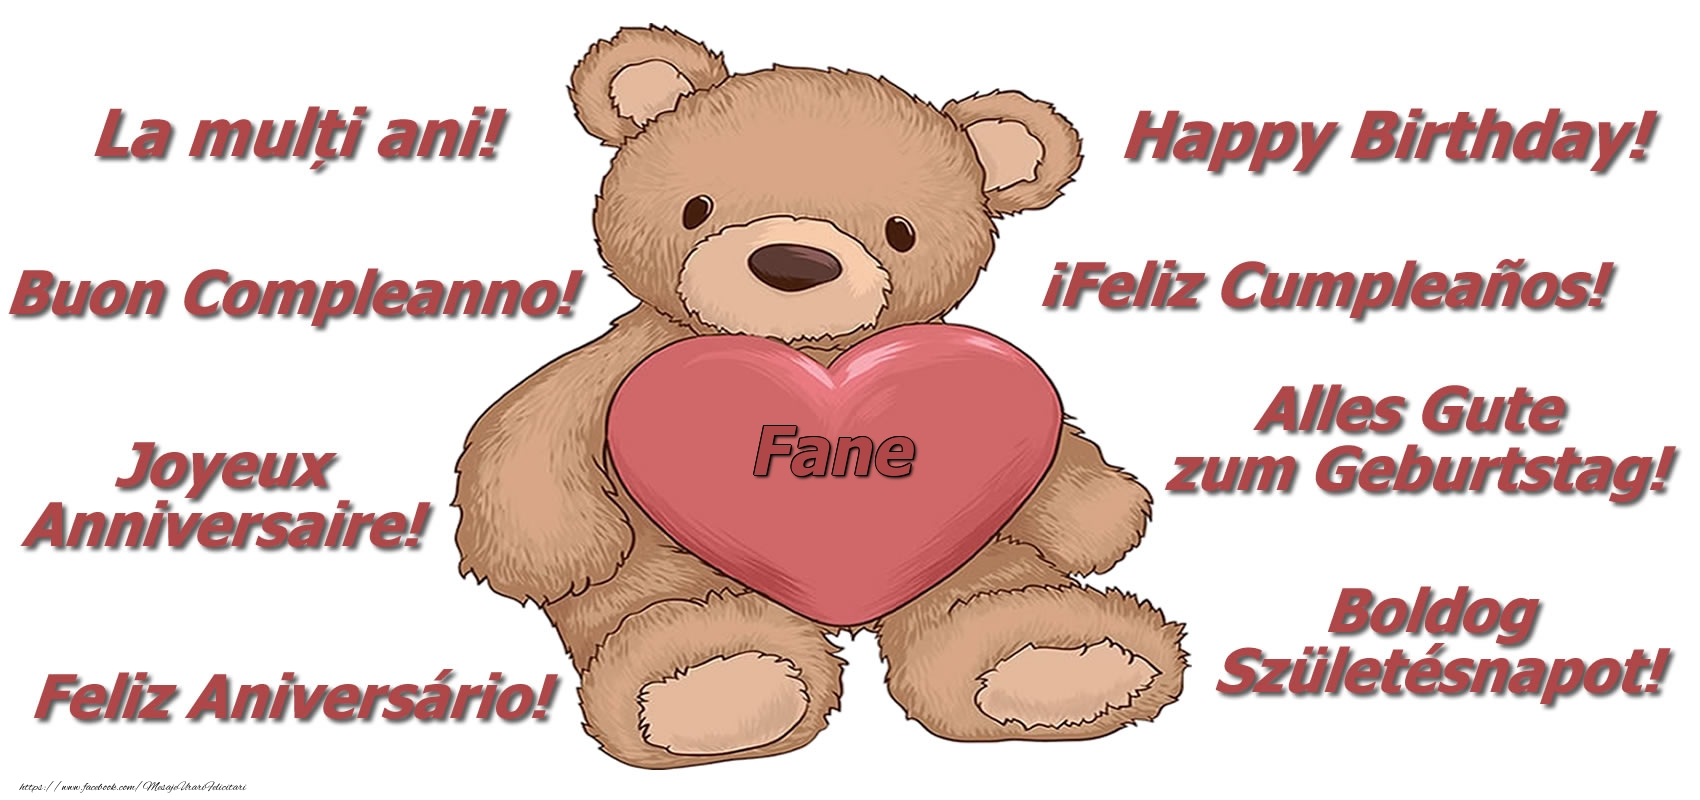 Felicitari de zi de nastere - La multi ani Fane! - Ursulet